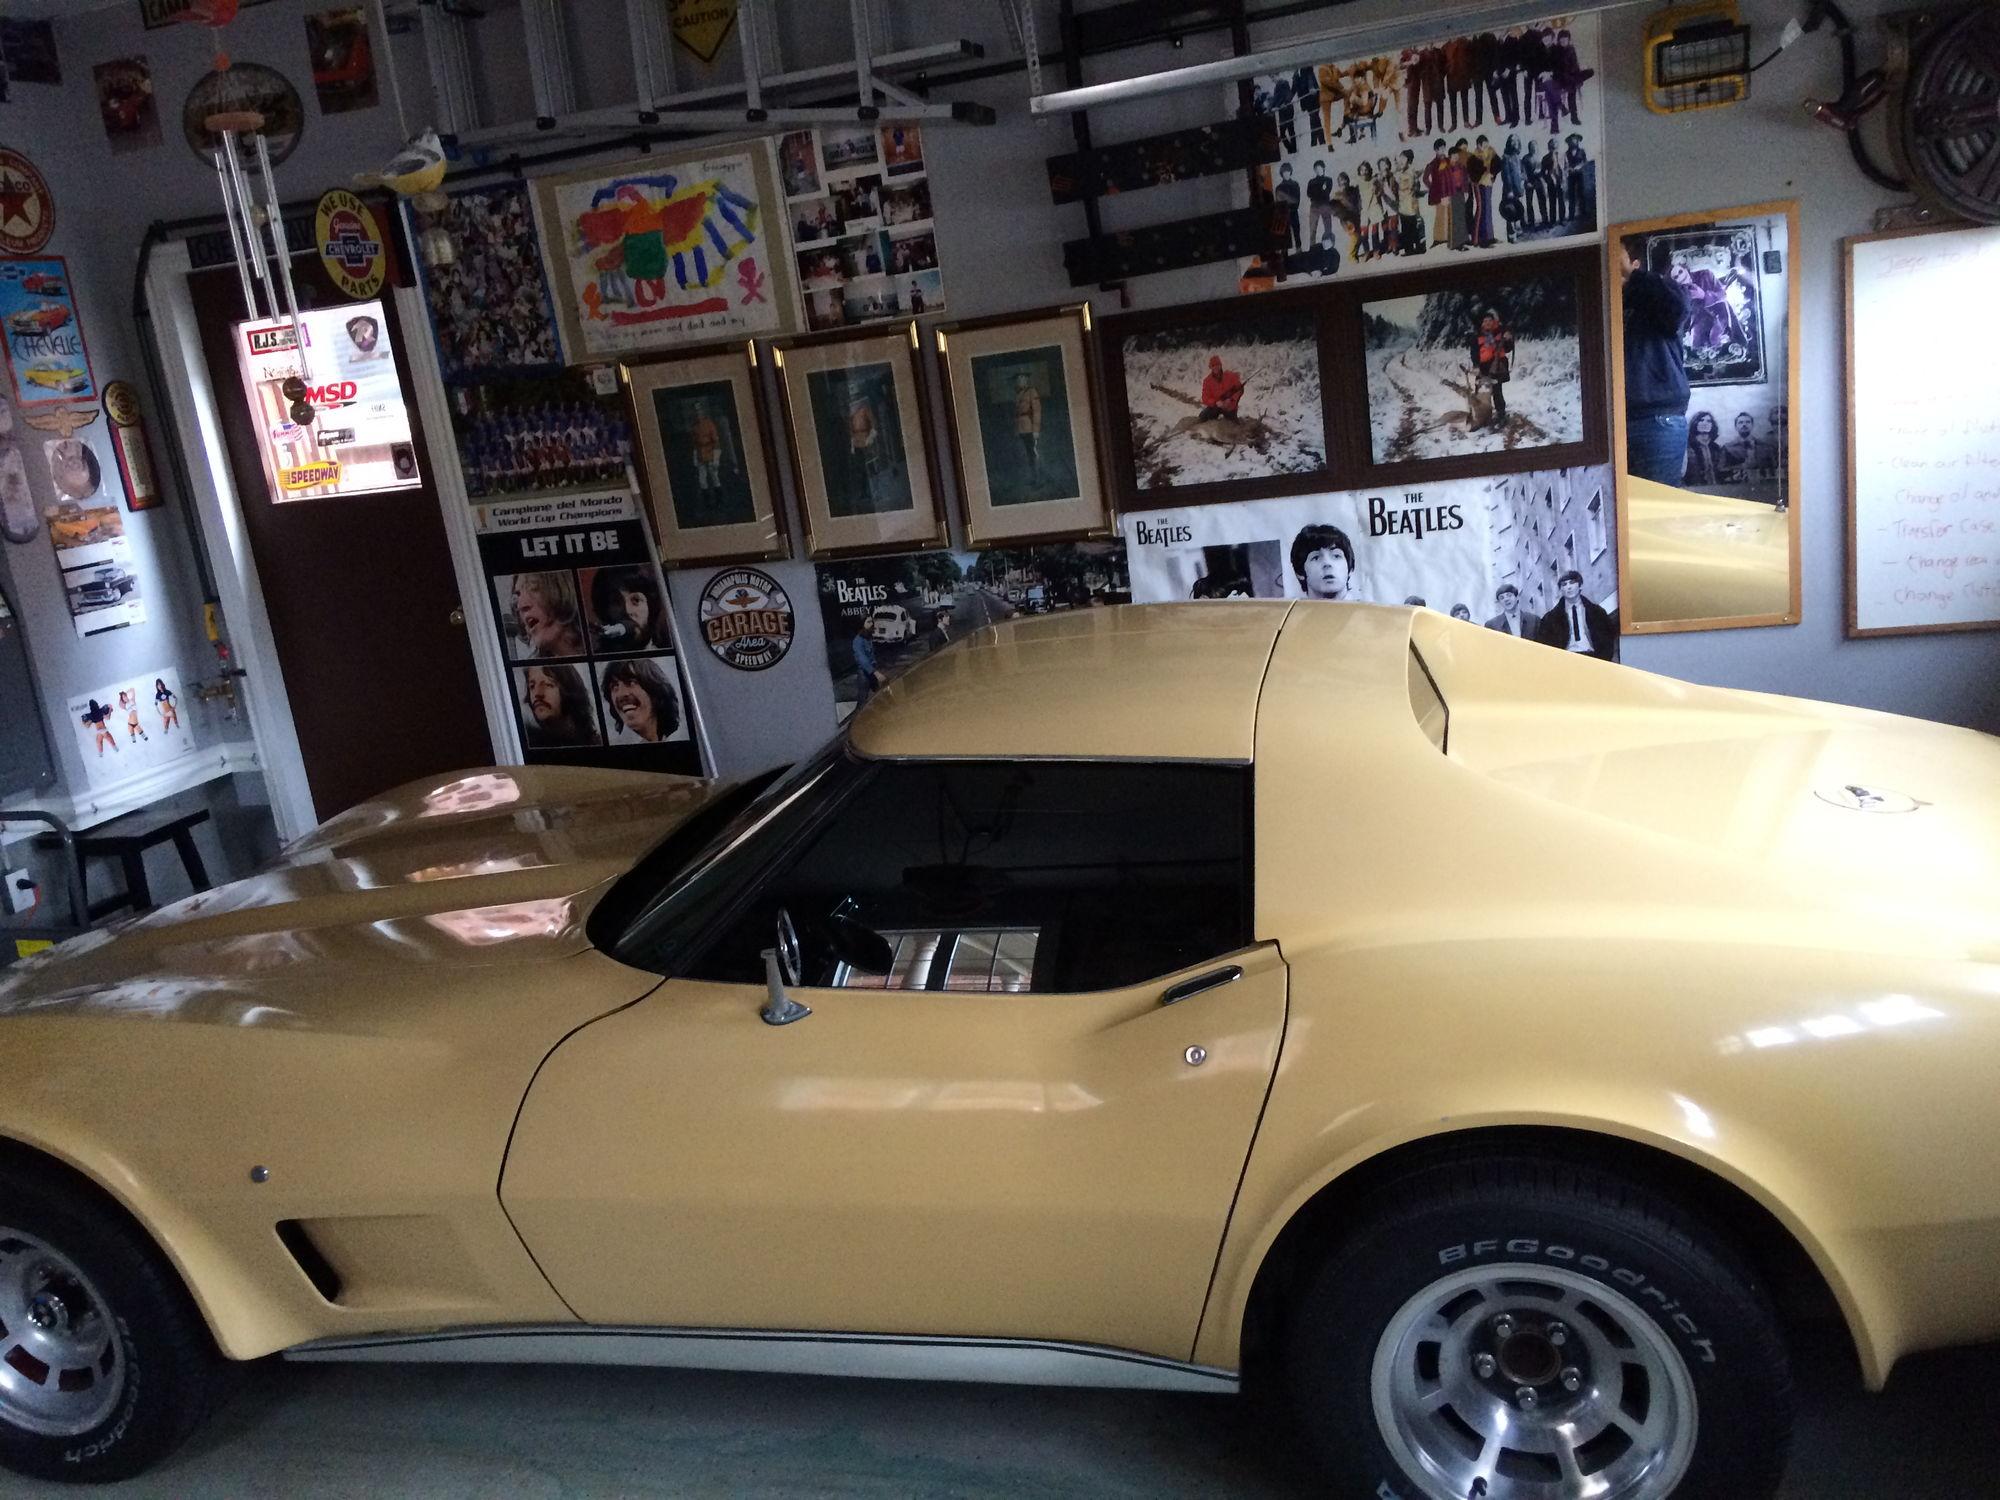 c3 1977 corvette tan corvette international. Black Bedroom Furniture Sets. Home Design Ideas